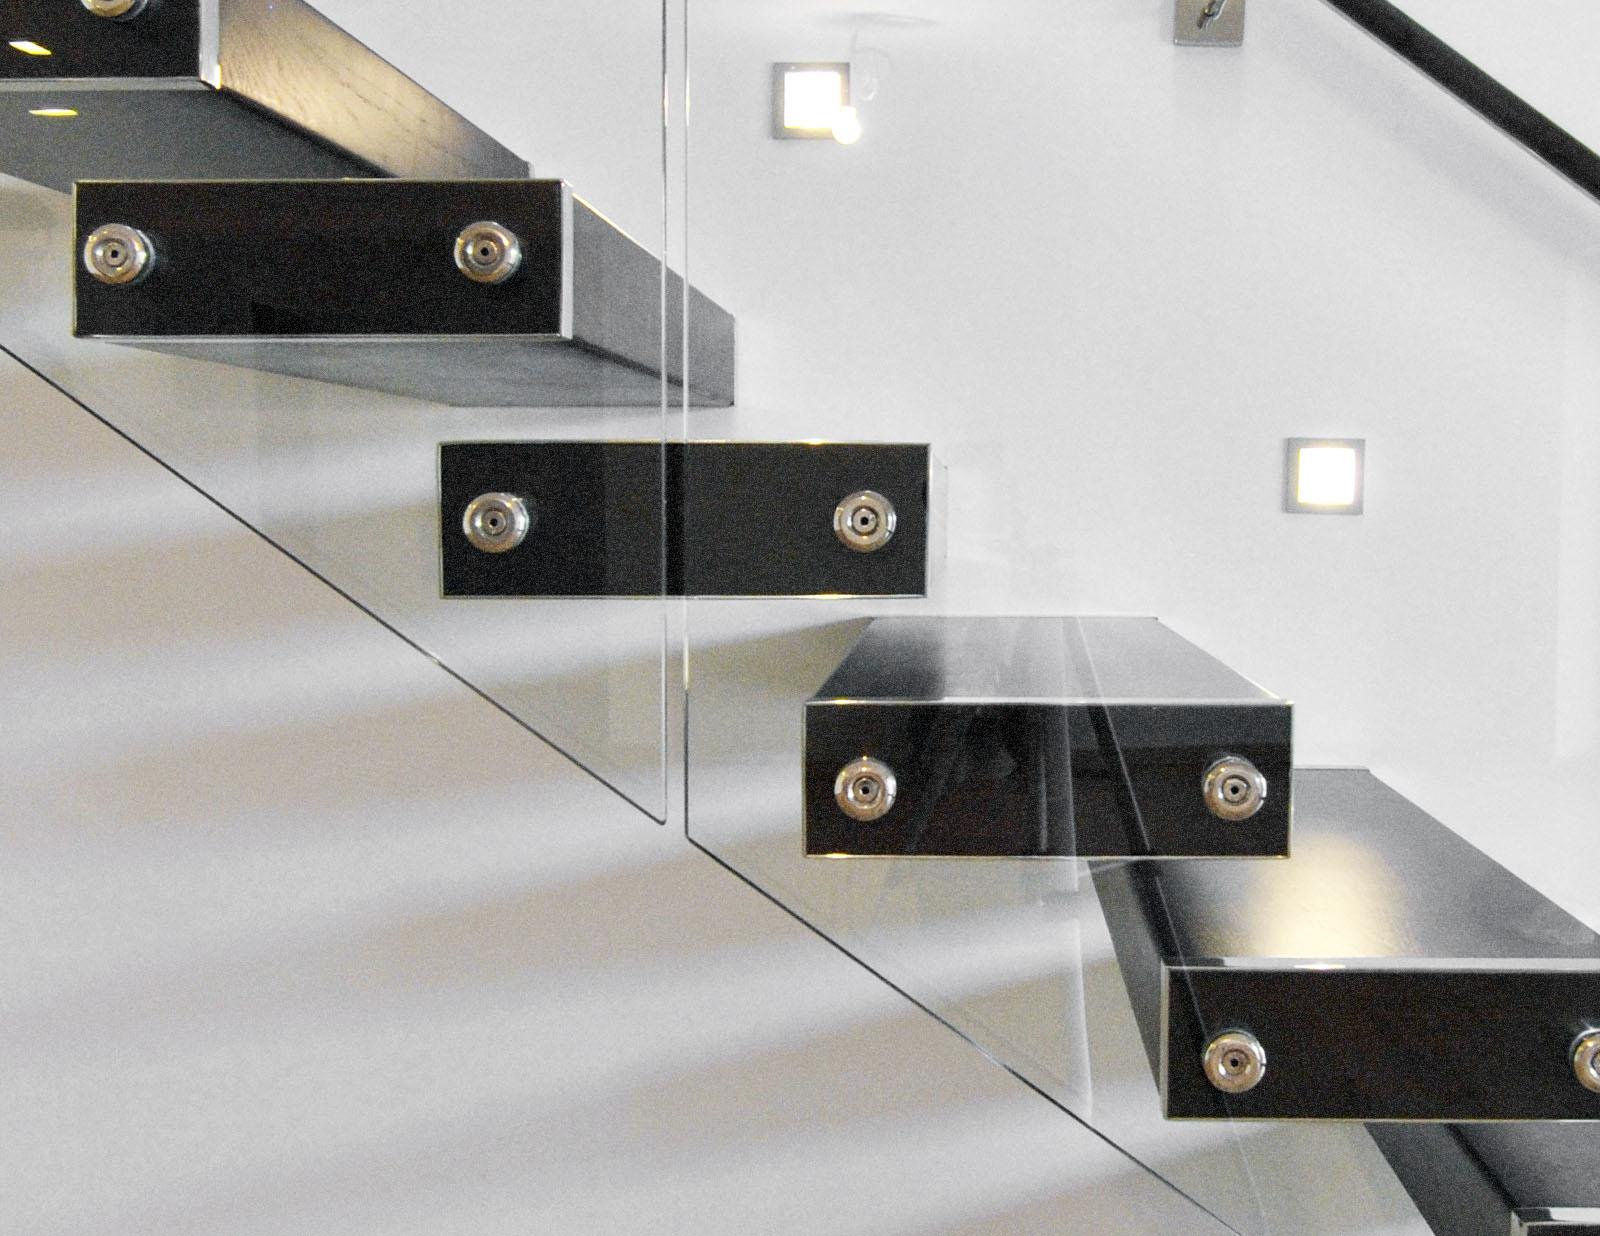 Scara trepte consola locuinta balustrada sticla haute couture